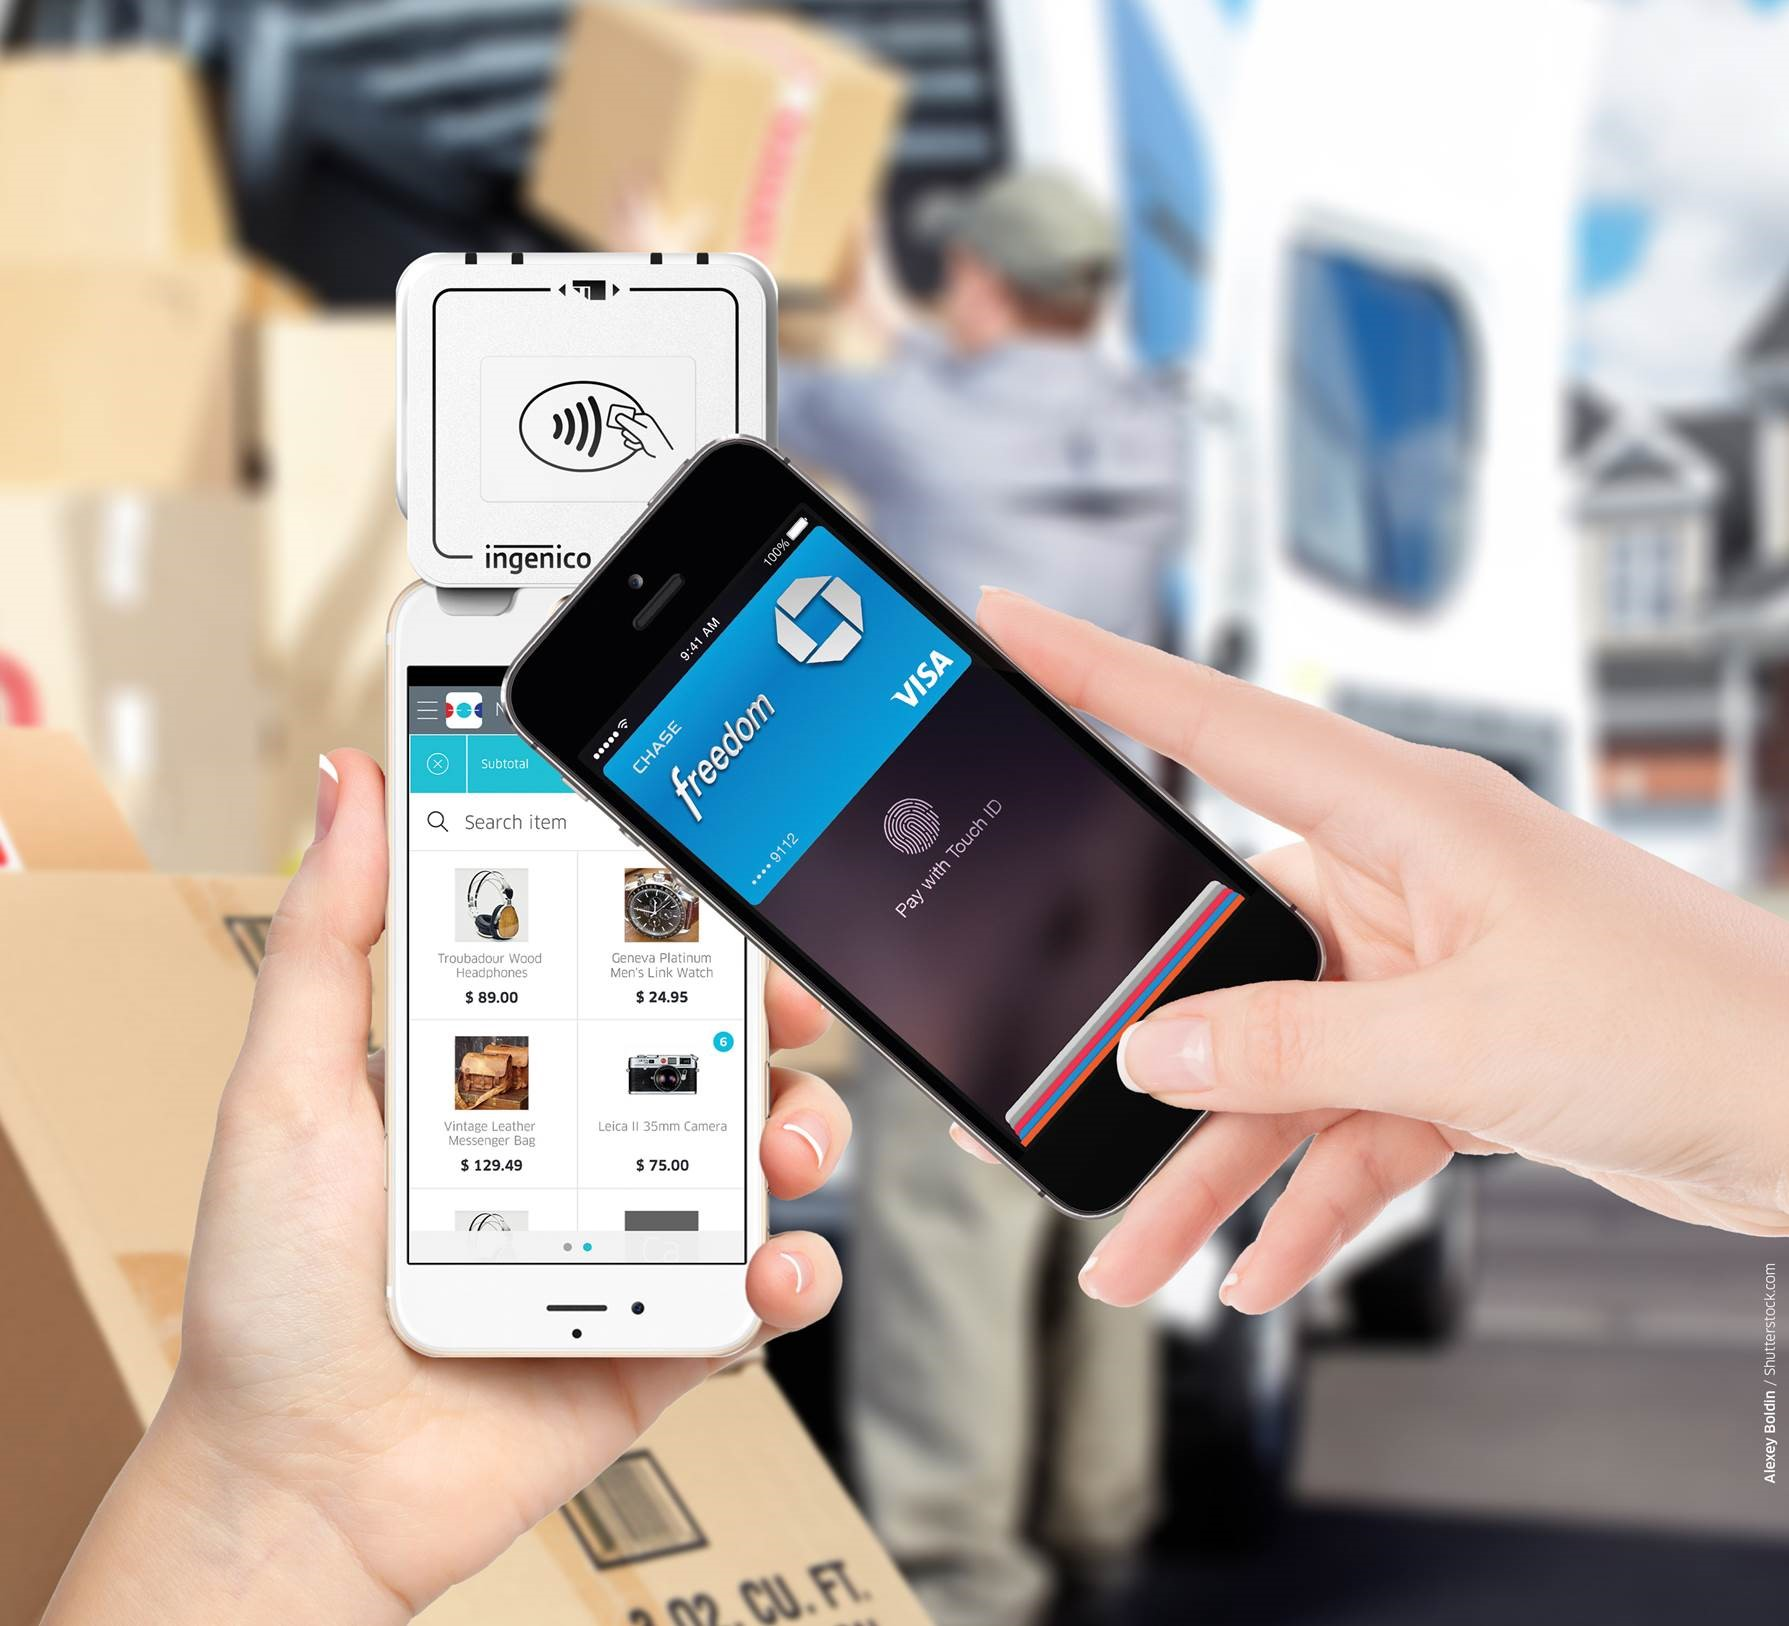 Ingenico Mobile Solutions RP170c